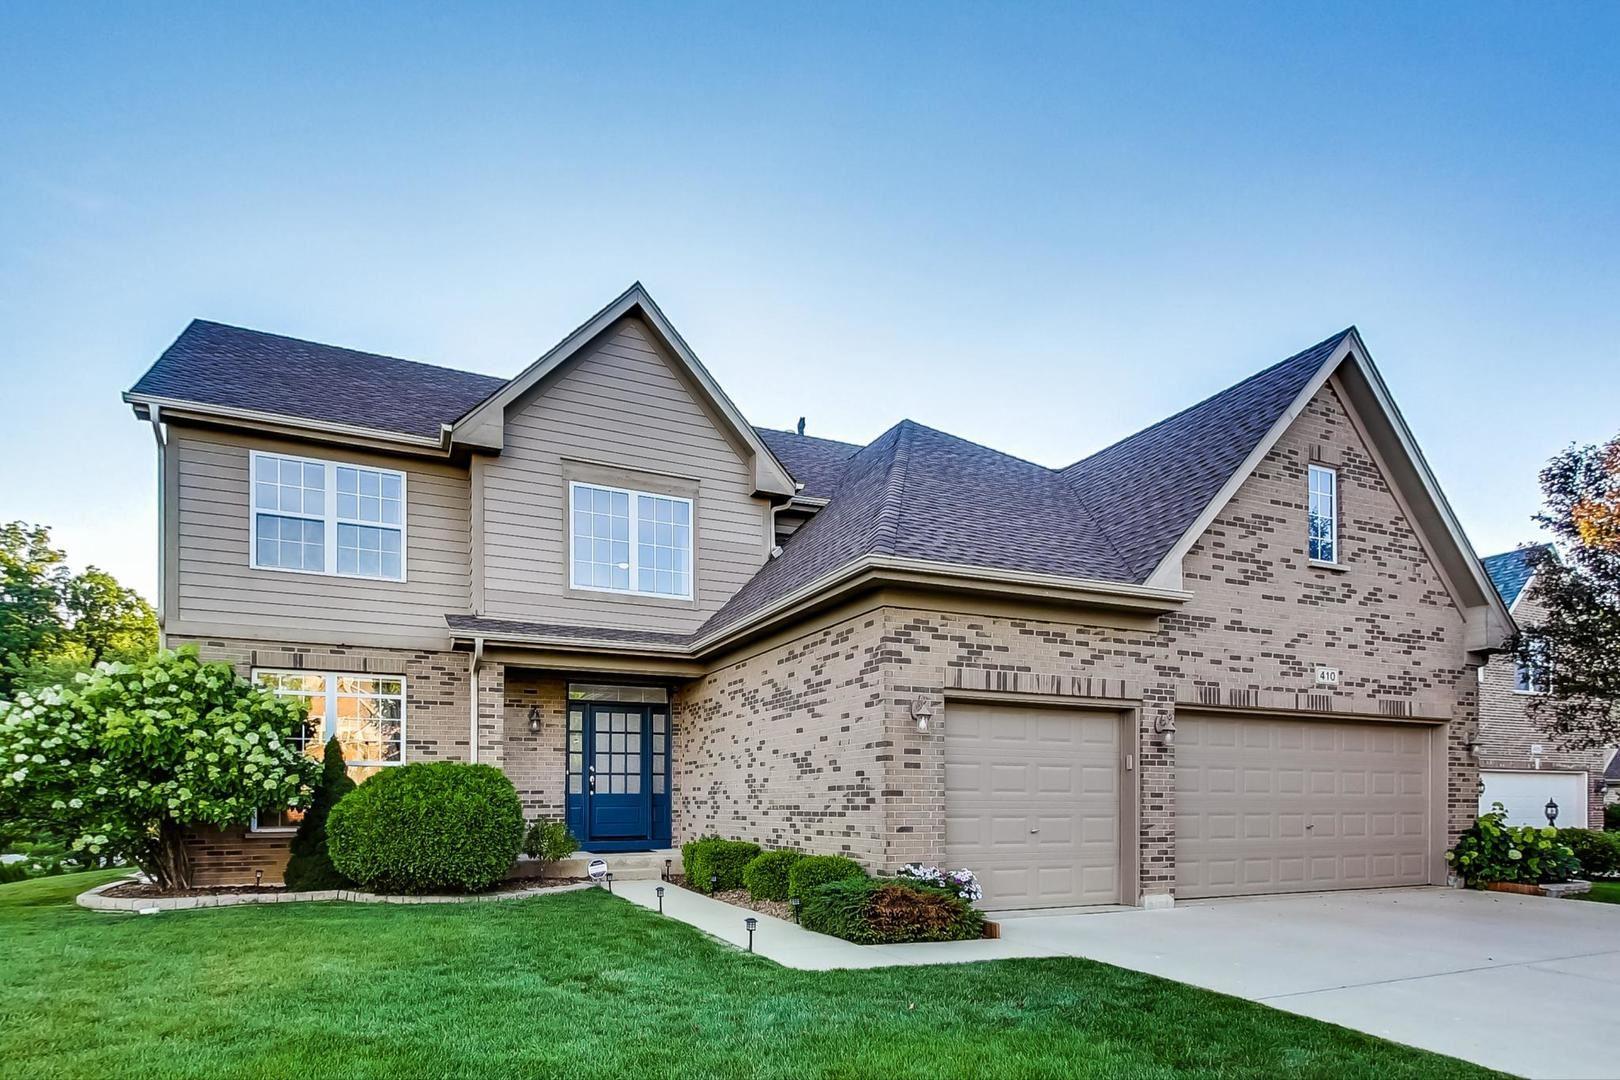 410 Elderberry Lane, Streamwood, IL 60107 - MLS#: 10799081